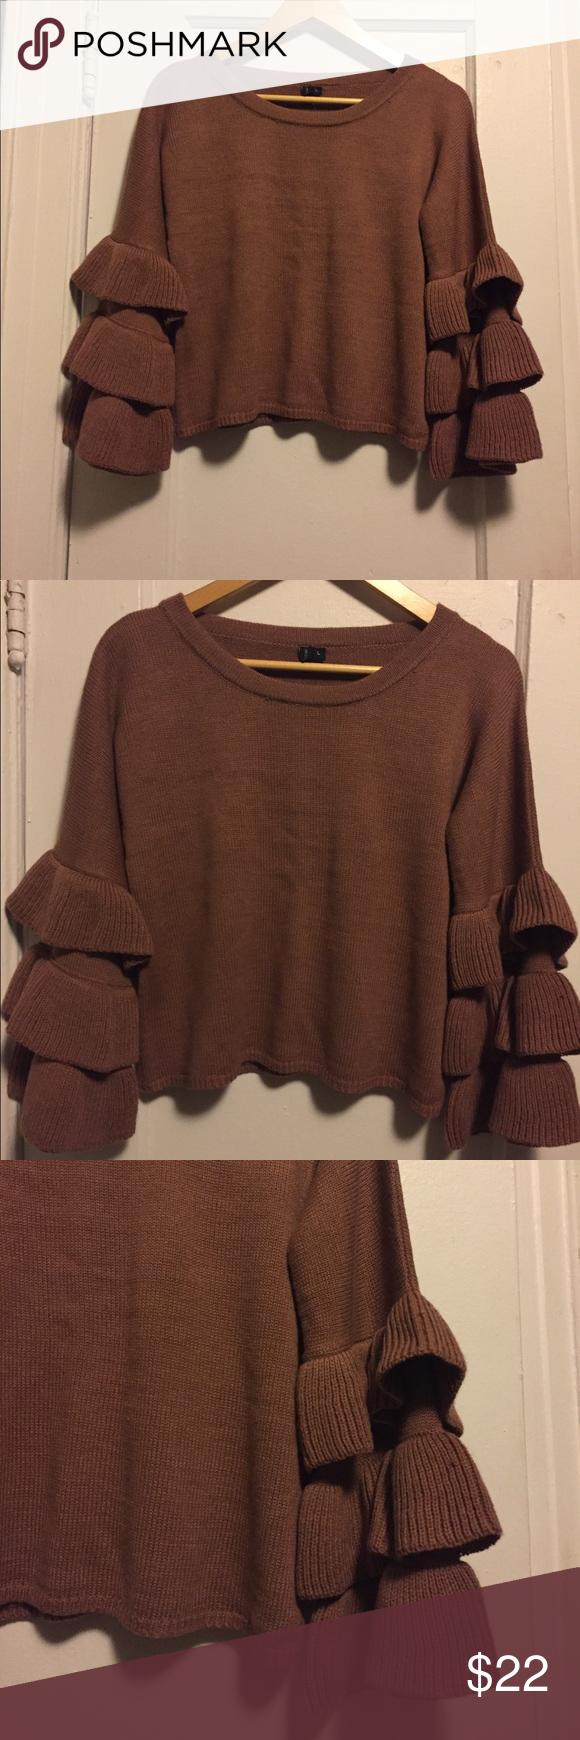 Moon Madison Ruffle Crop Sweater Nwt My Posh Closet